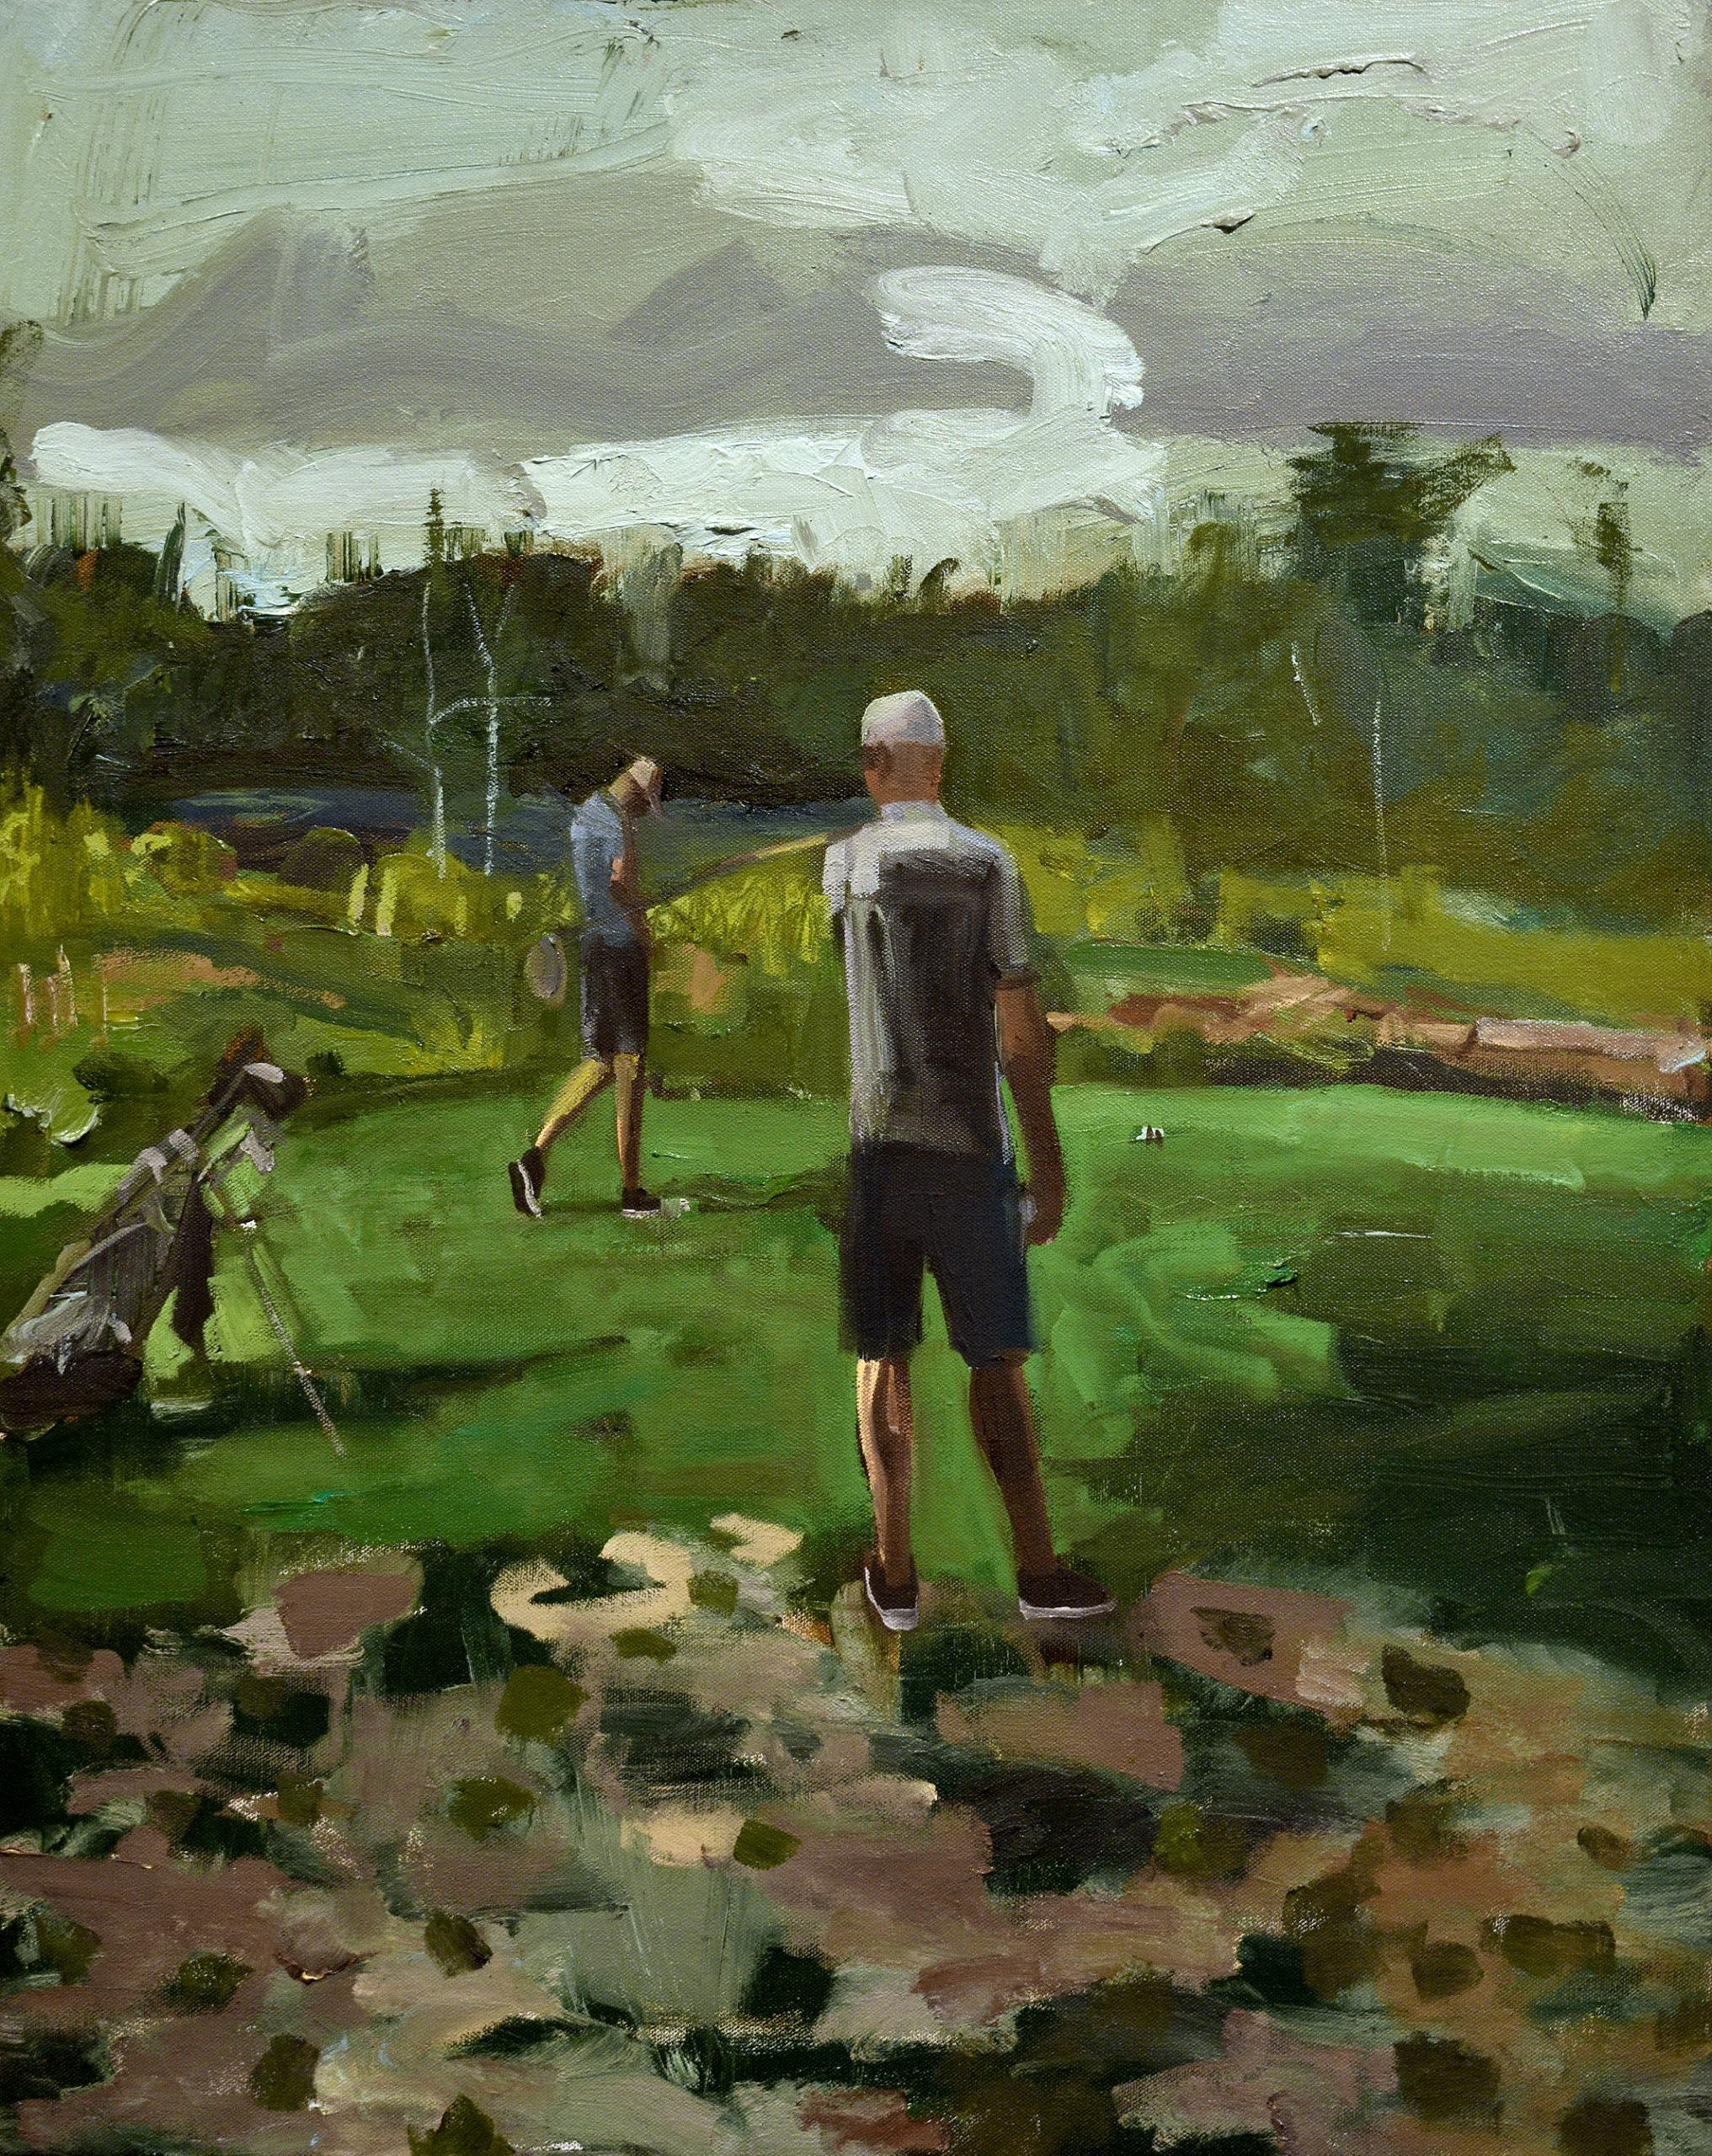 two men play golf